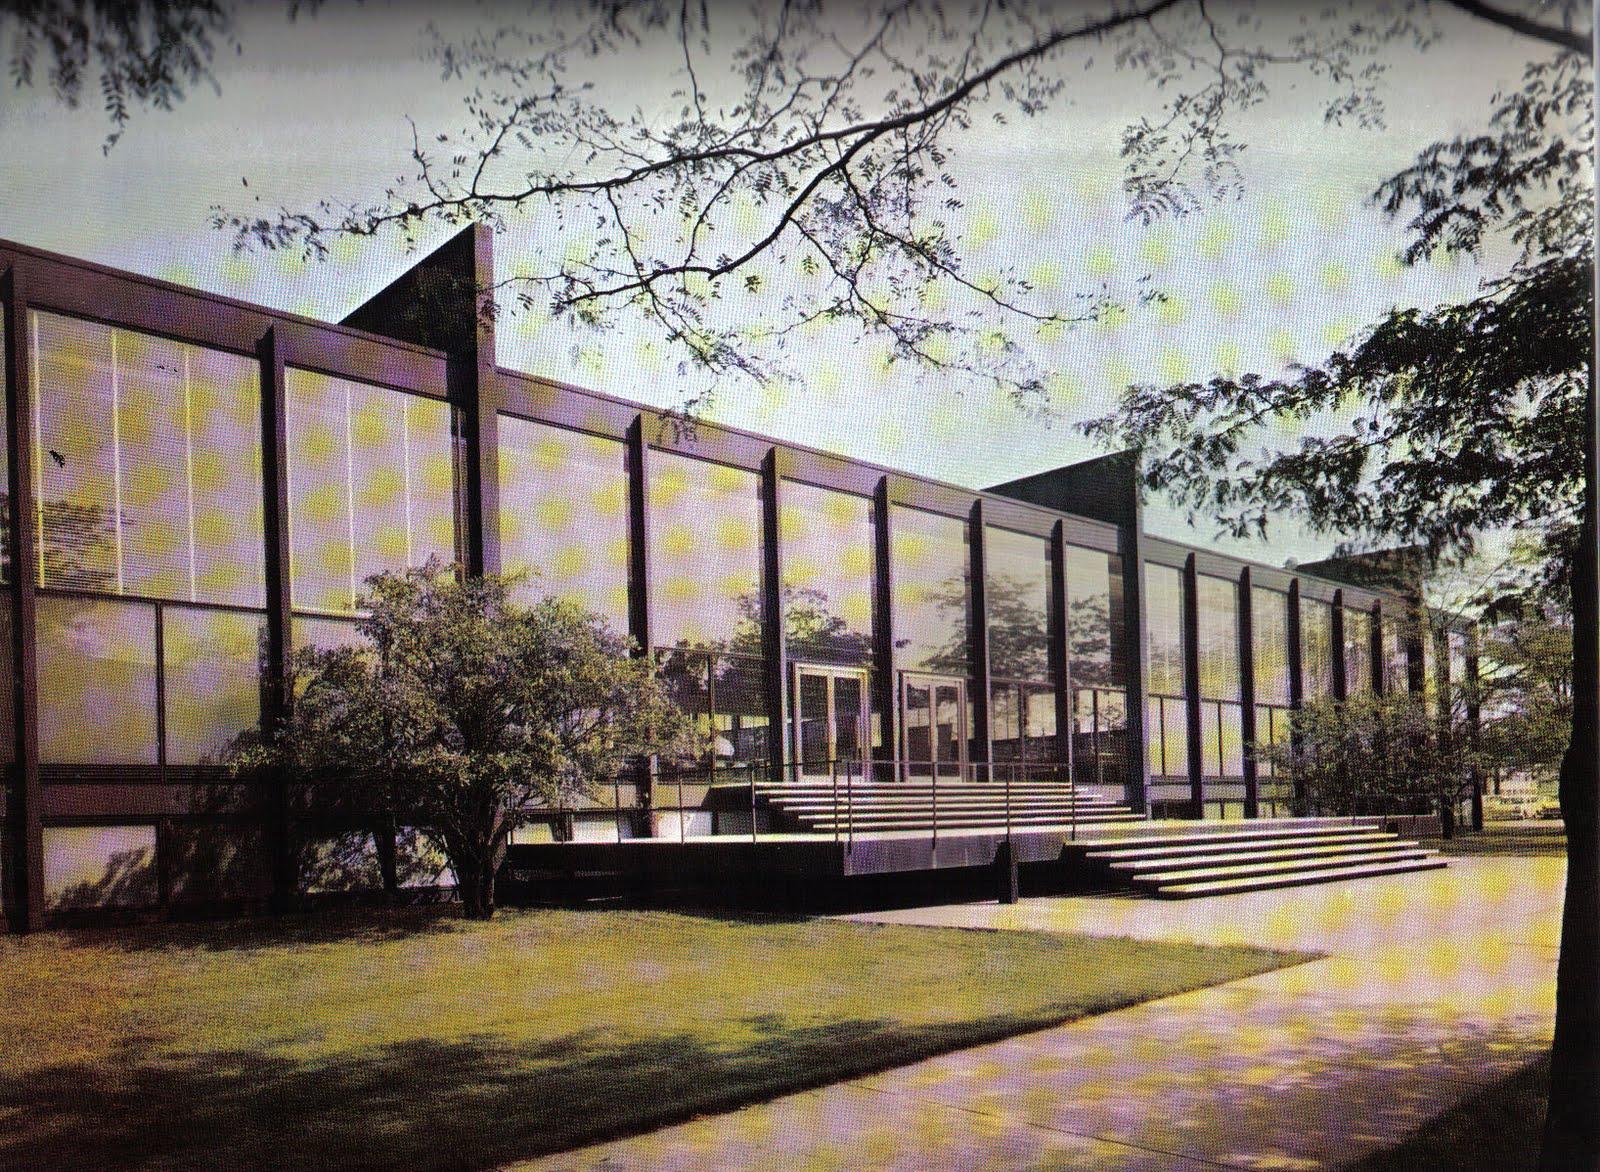 mies-van-der-rohe-Escola-de-Arquitetura-do-Instituto-de-Tecnologia-de-Illinois